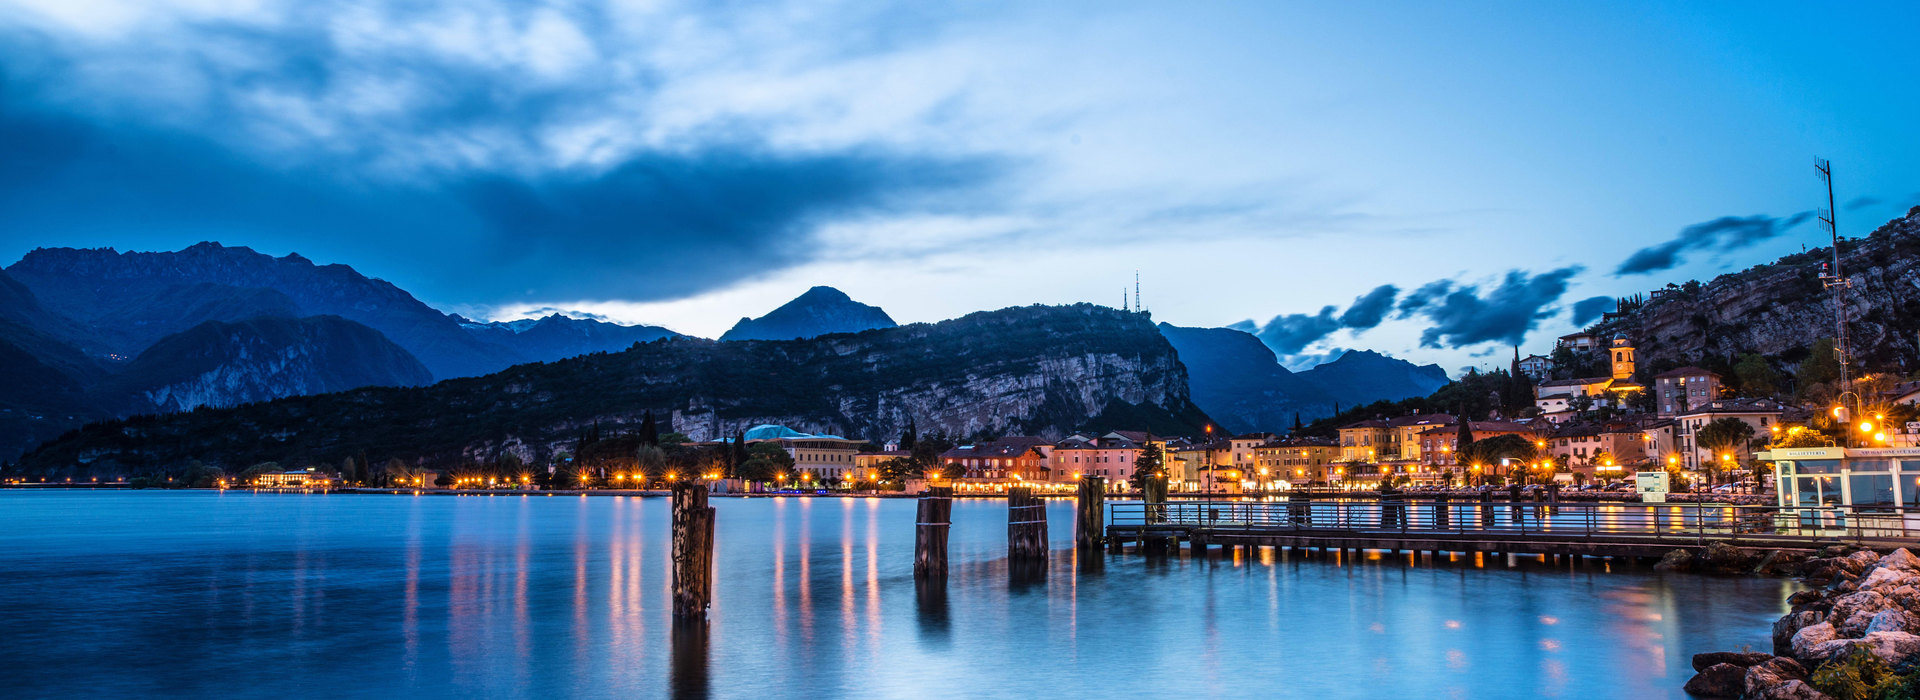 Vista notturna sul lago di Garda